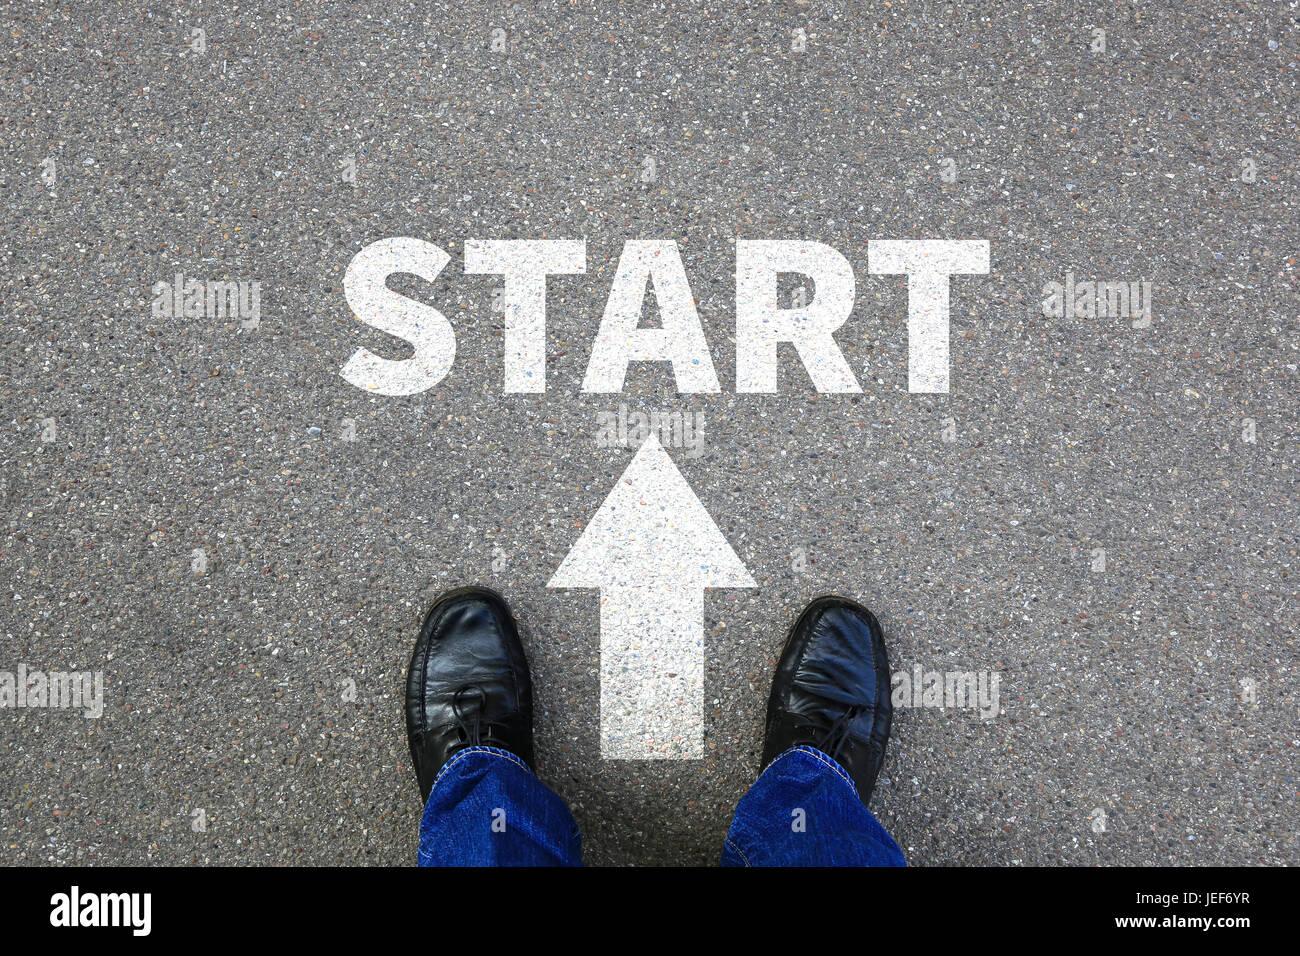 Start starting begin beginning businessman business concept job career goals motivation vision - Stock Image